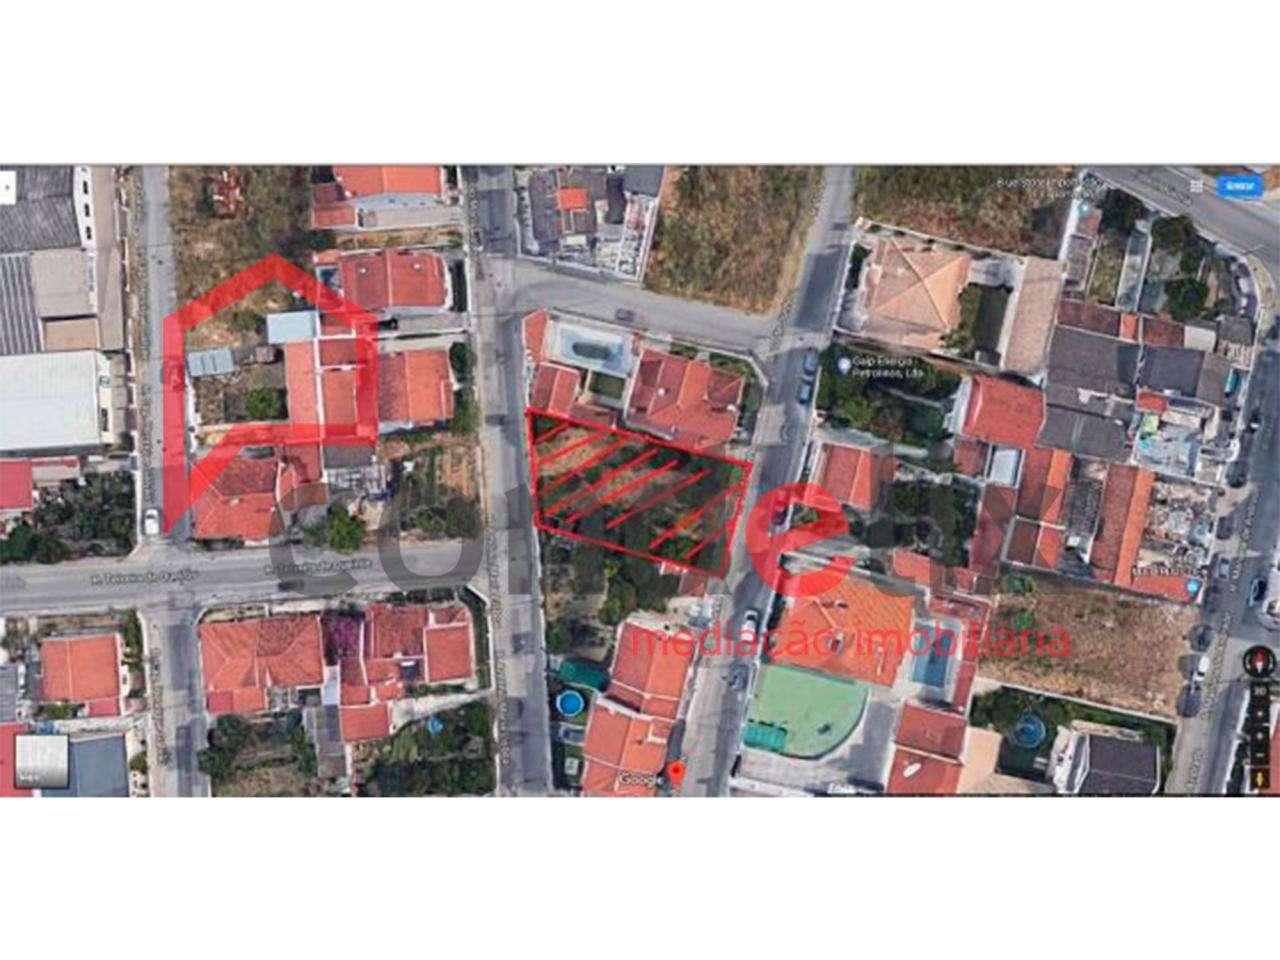 Terreno para comprar, Seixal, Arrentela e Aldeia de Paio Pires, Setúbal - Foto 4